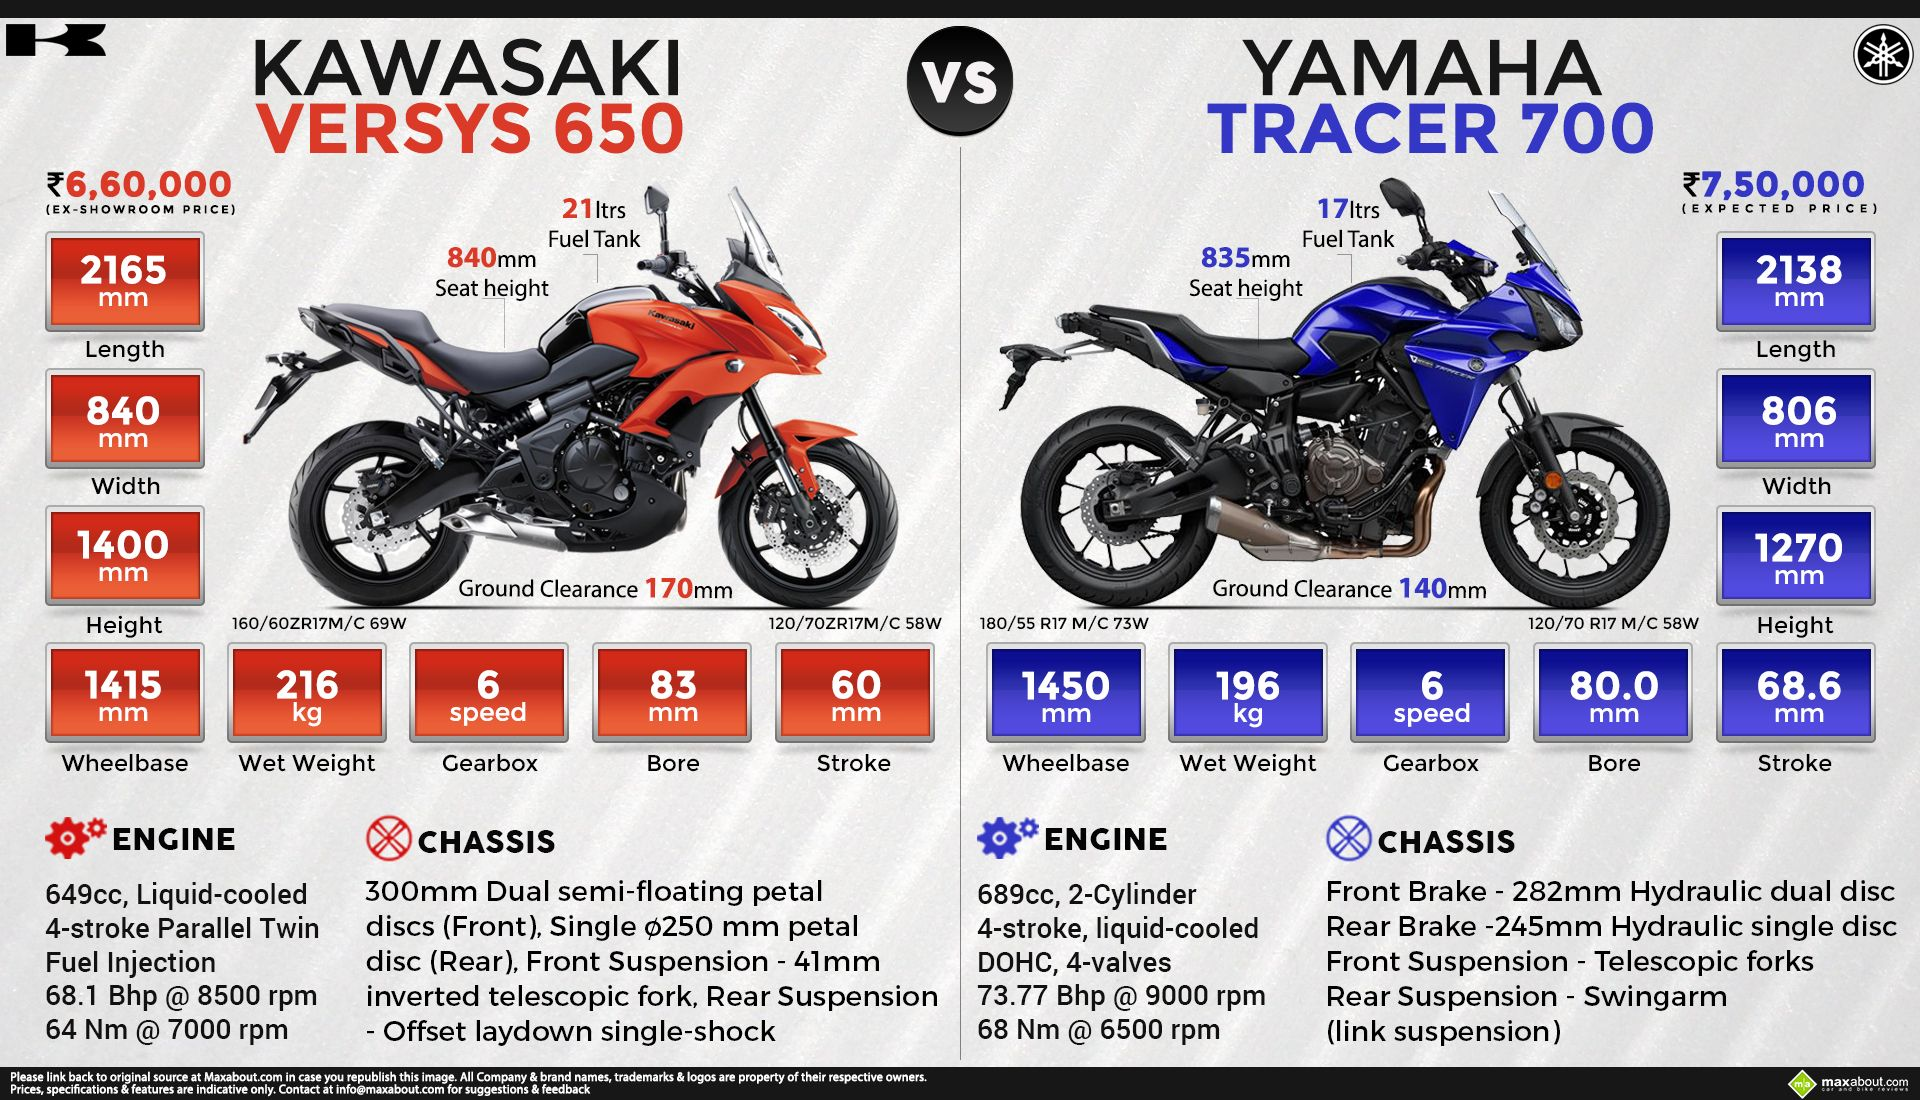 Kawasaki Versys 650 Vs Yamaha Tracer 700 Versys 650 Versys